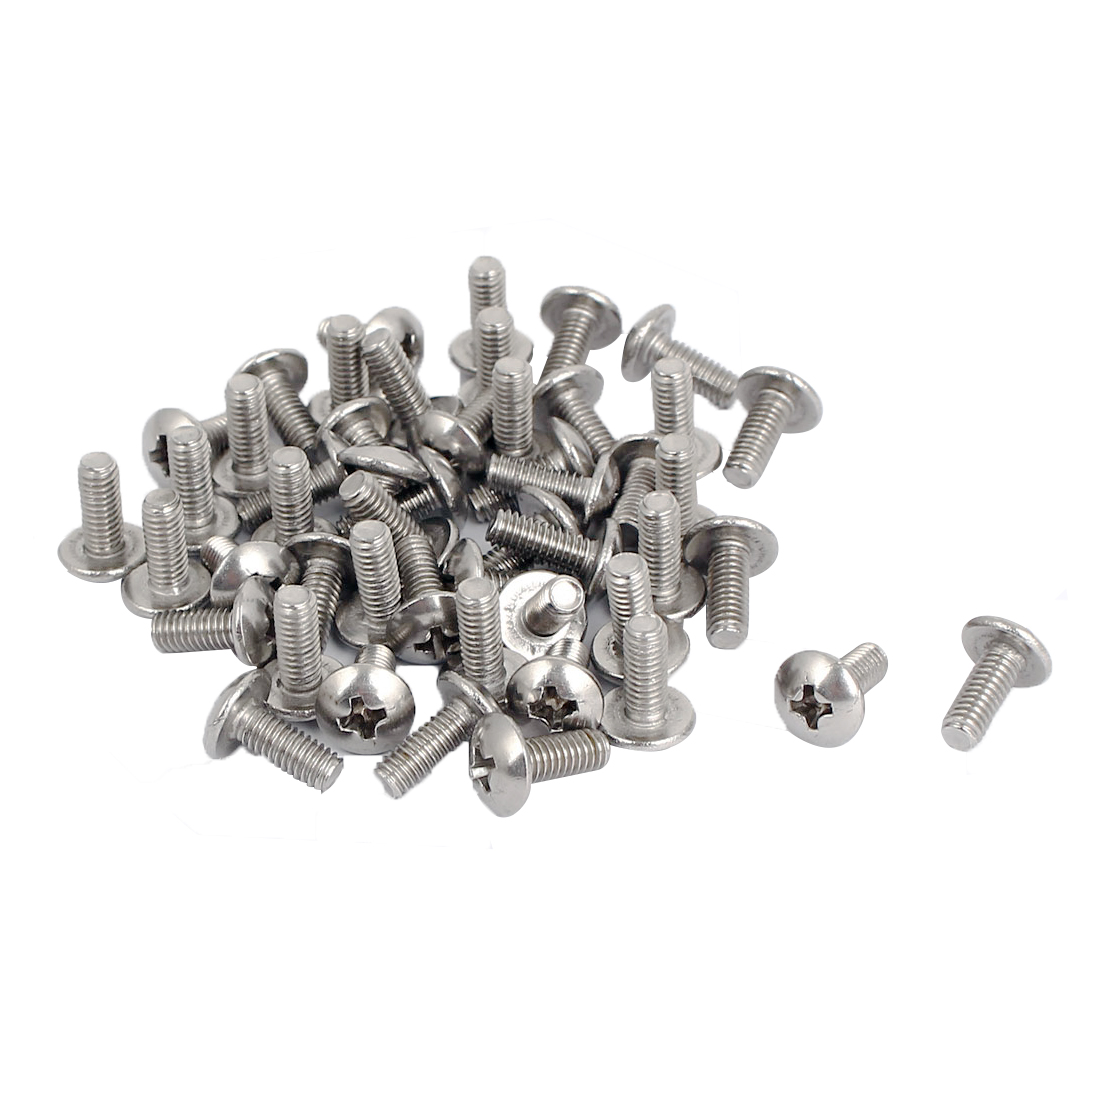 M4x10mm Stainless Steel Truss Phillips Head Machine Screws 50pcs